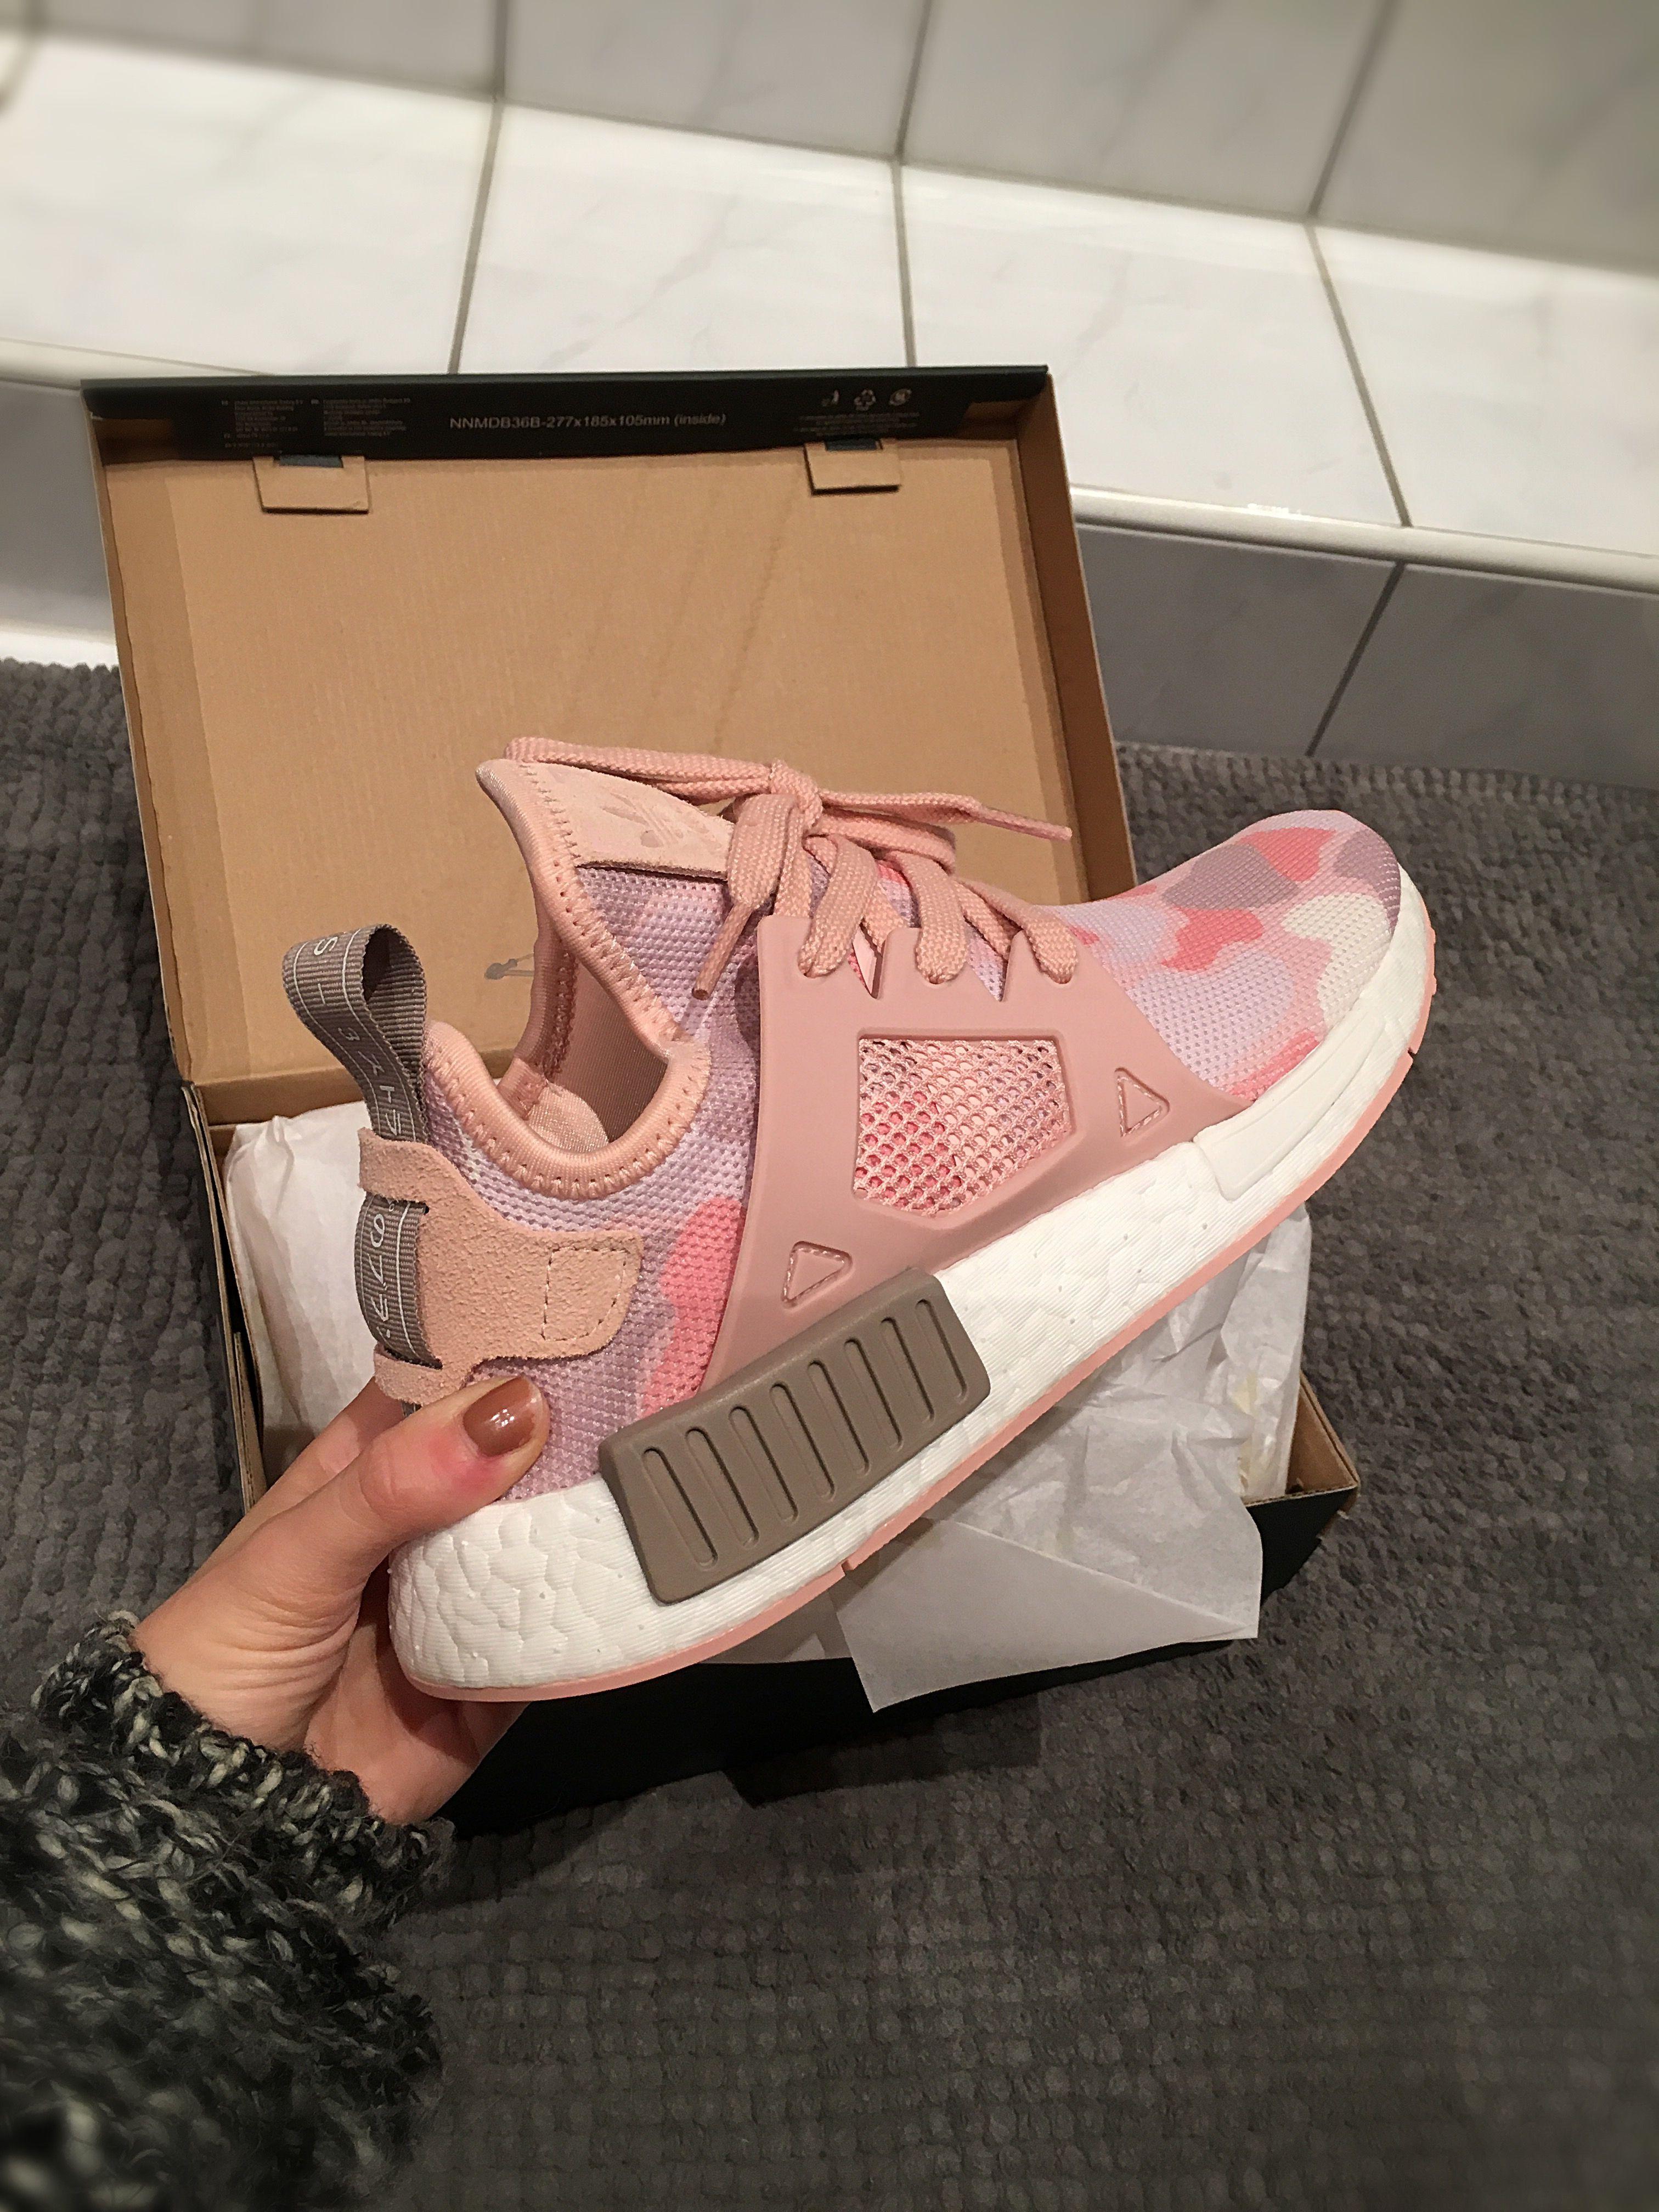 ADIDAS NMD XR1 W Pink Duck Camo White Womens XR_1 BA7753 Limited